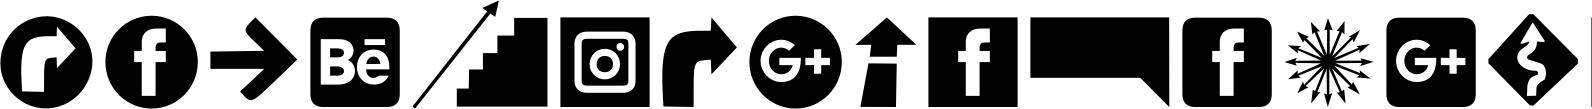 Icons Dingbats Symbols Set